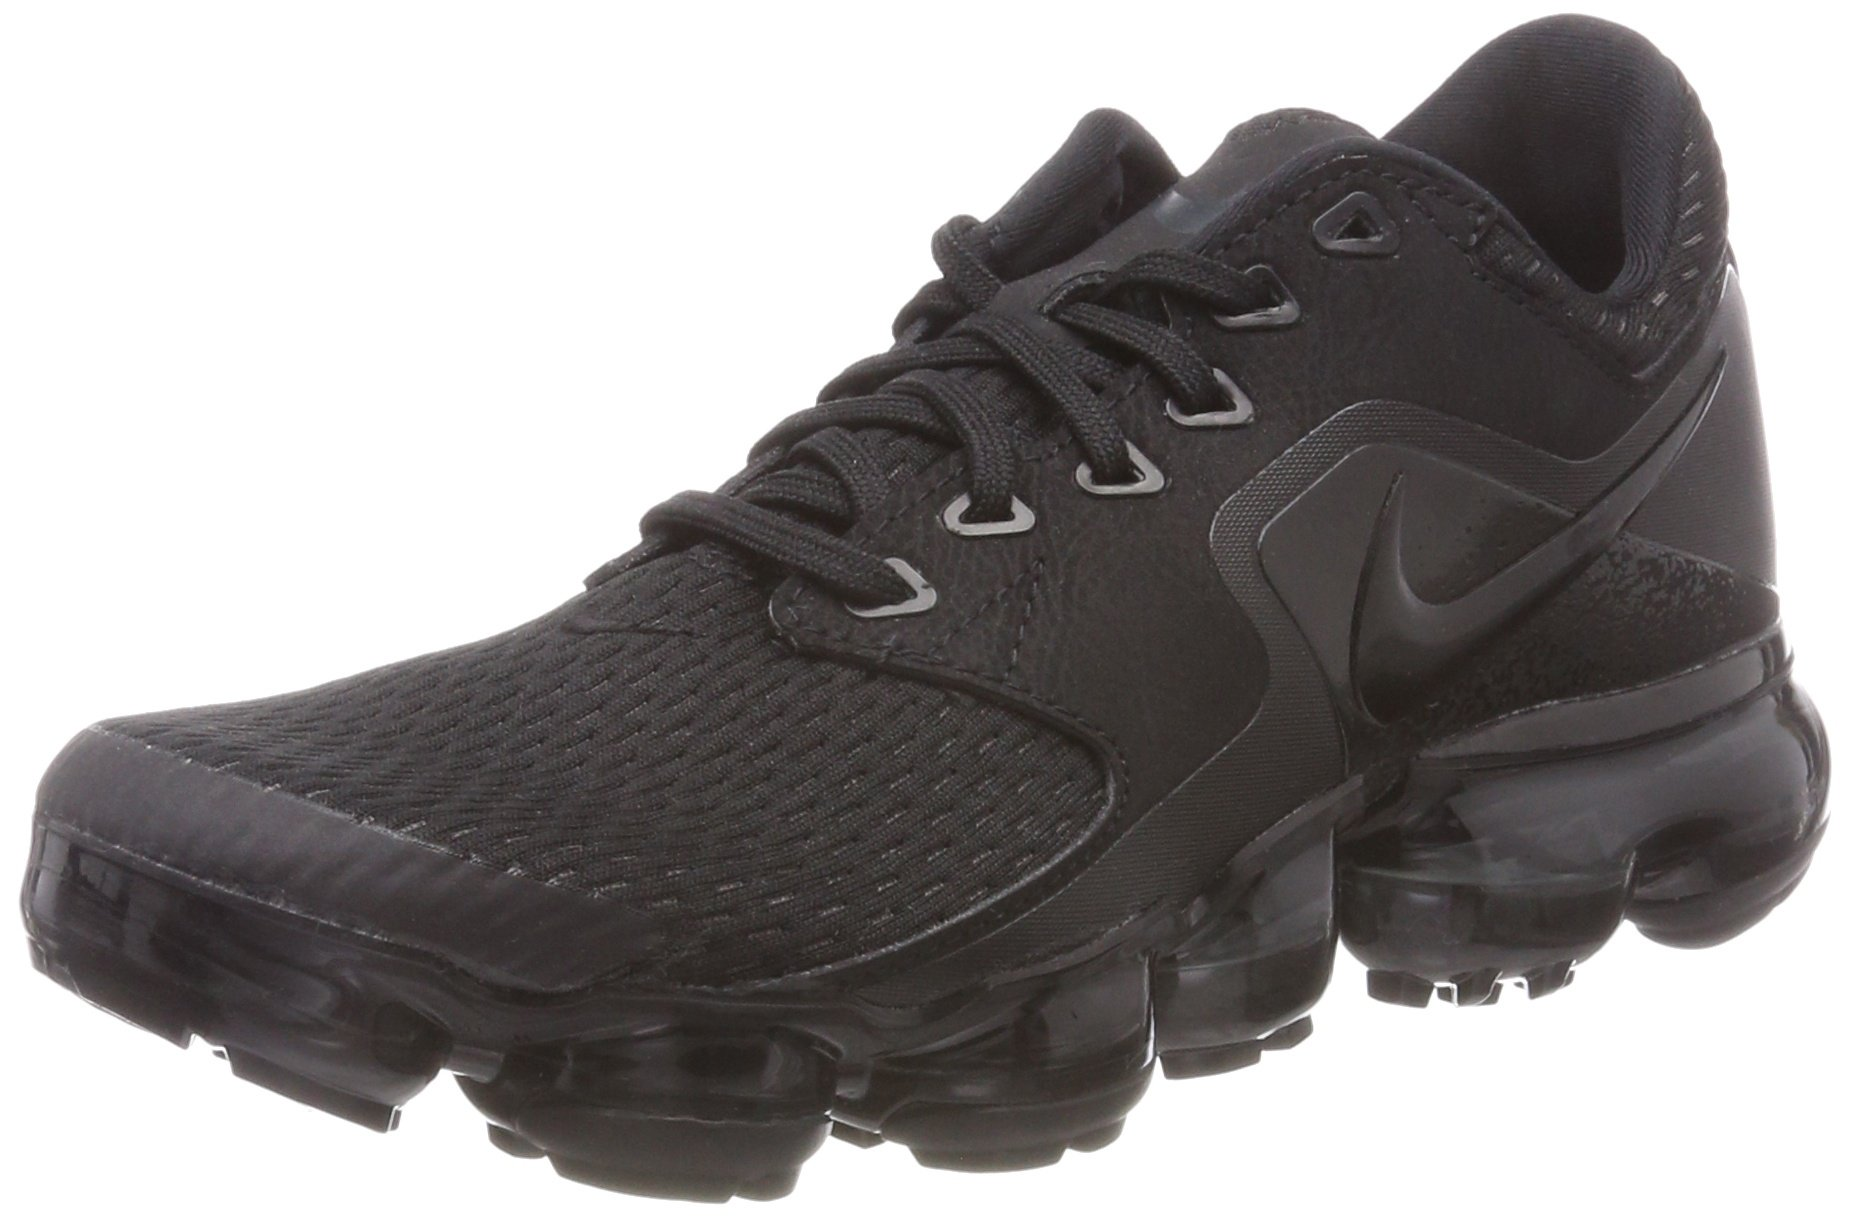 Nike Kids' Grade School Air Vapormax Running Shoes (5.5) by Nike (Image #1)